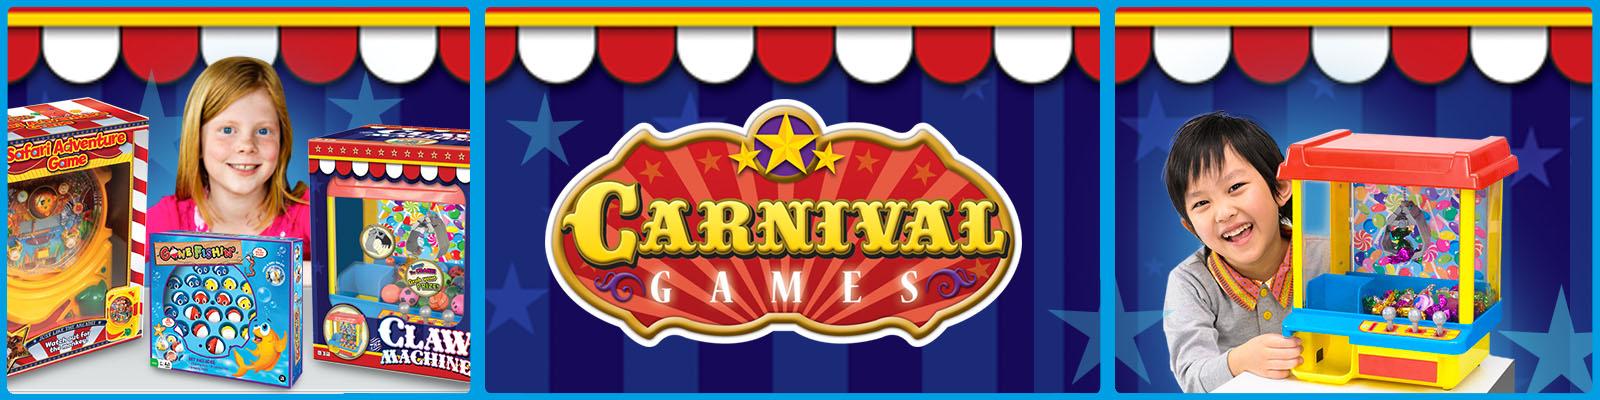 Karnevalspiele